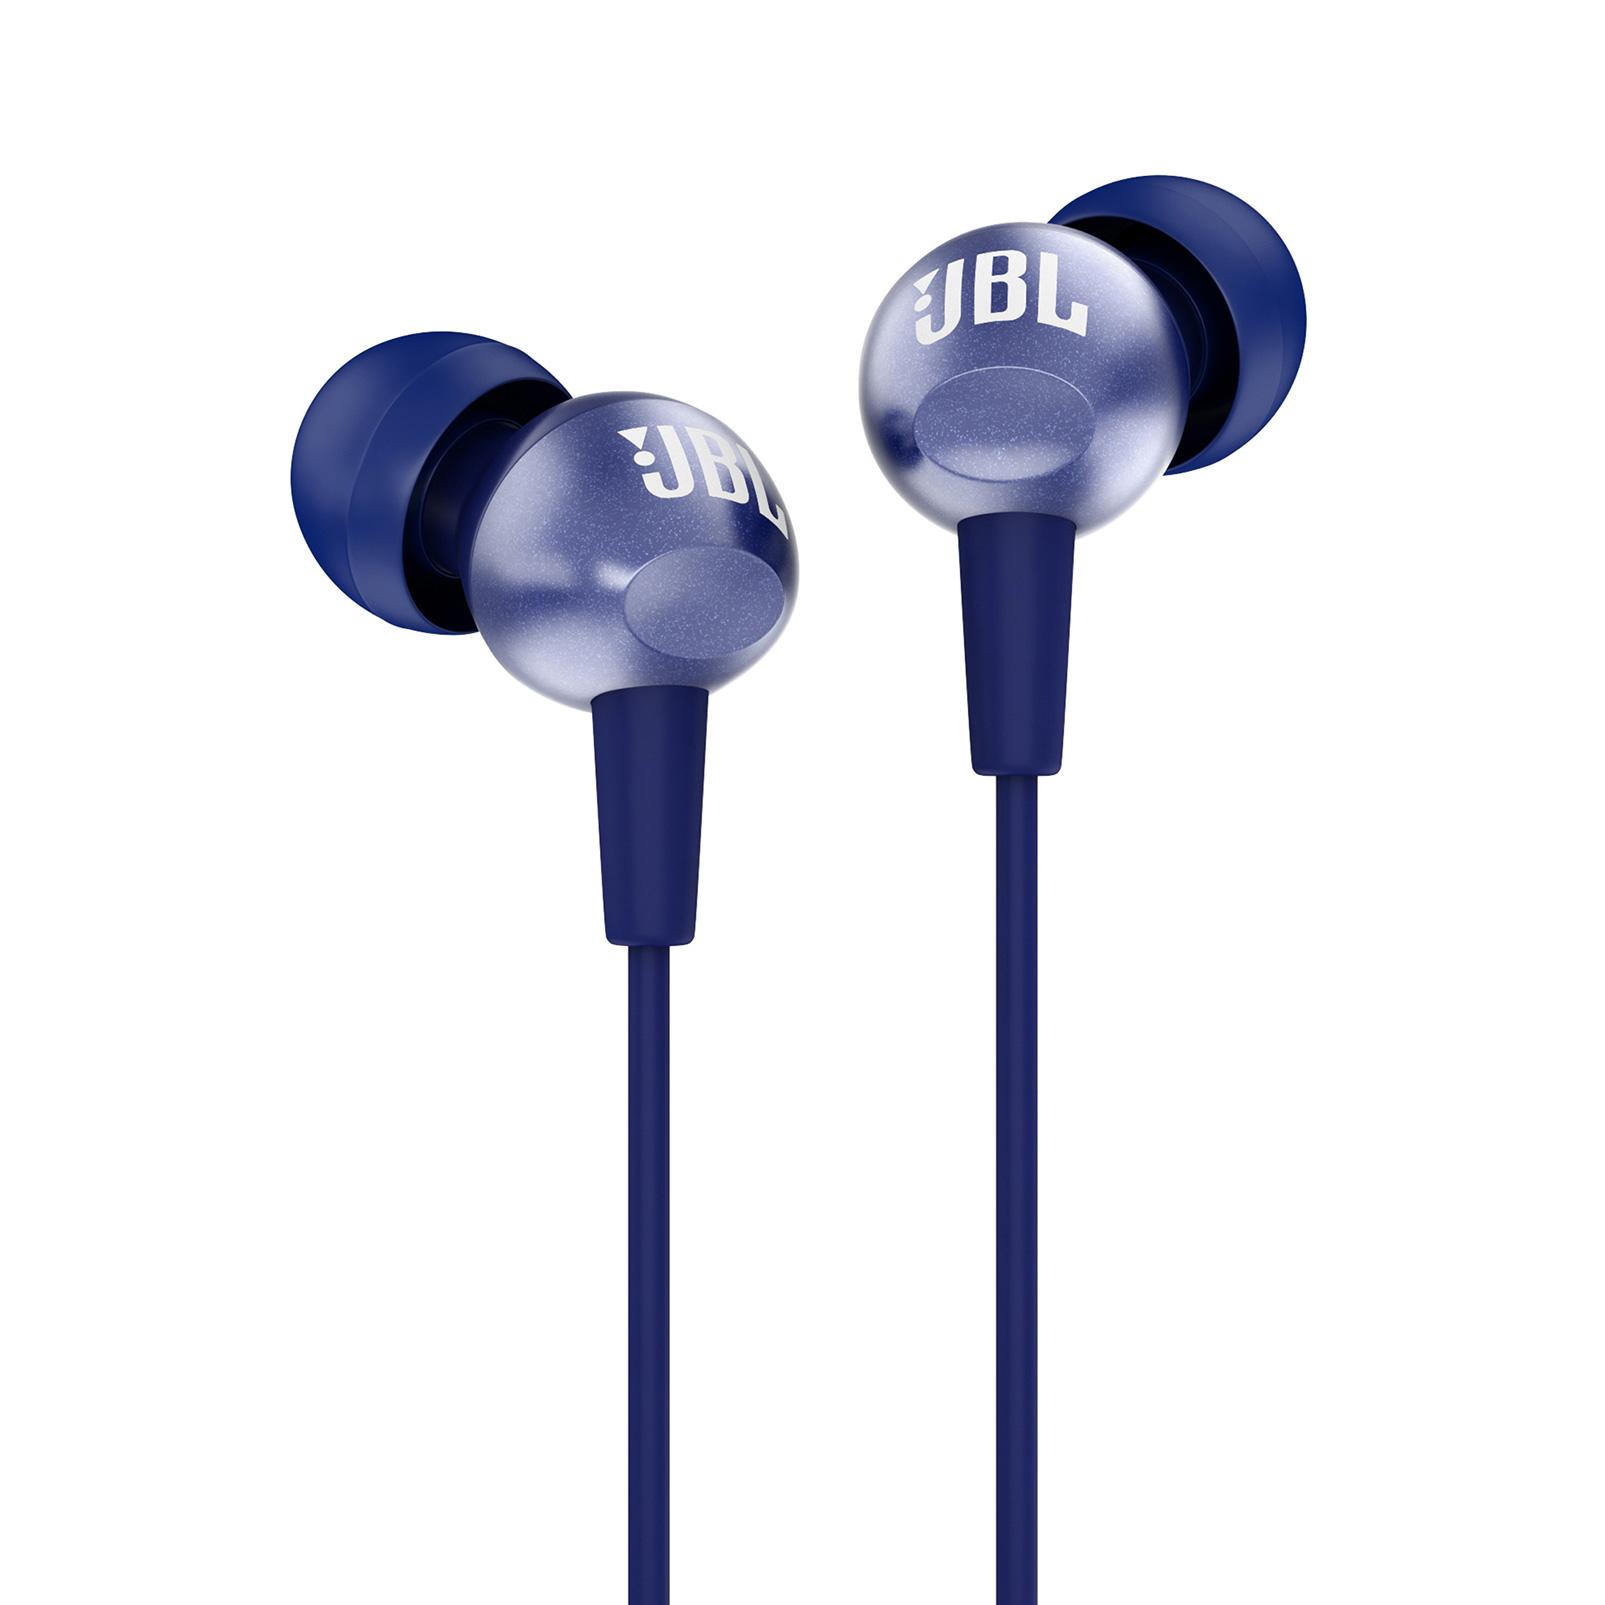 C200SI - Blue - In-Ear Headphones - Detailshot 1